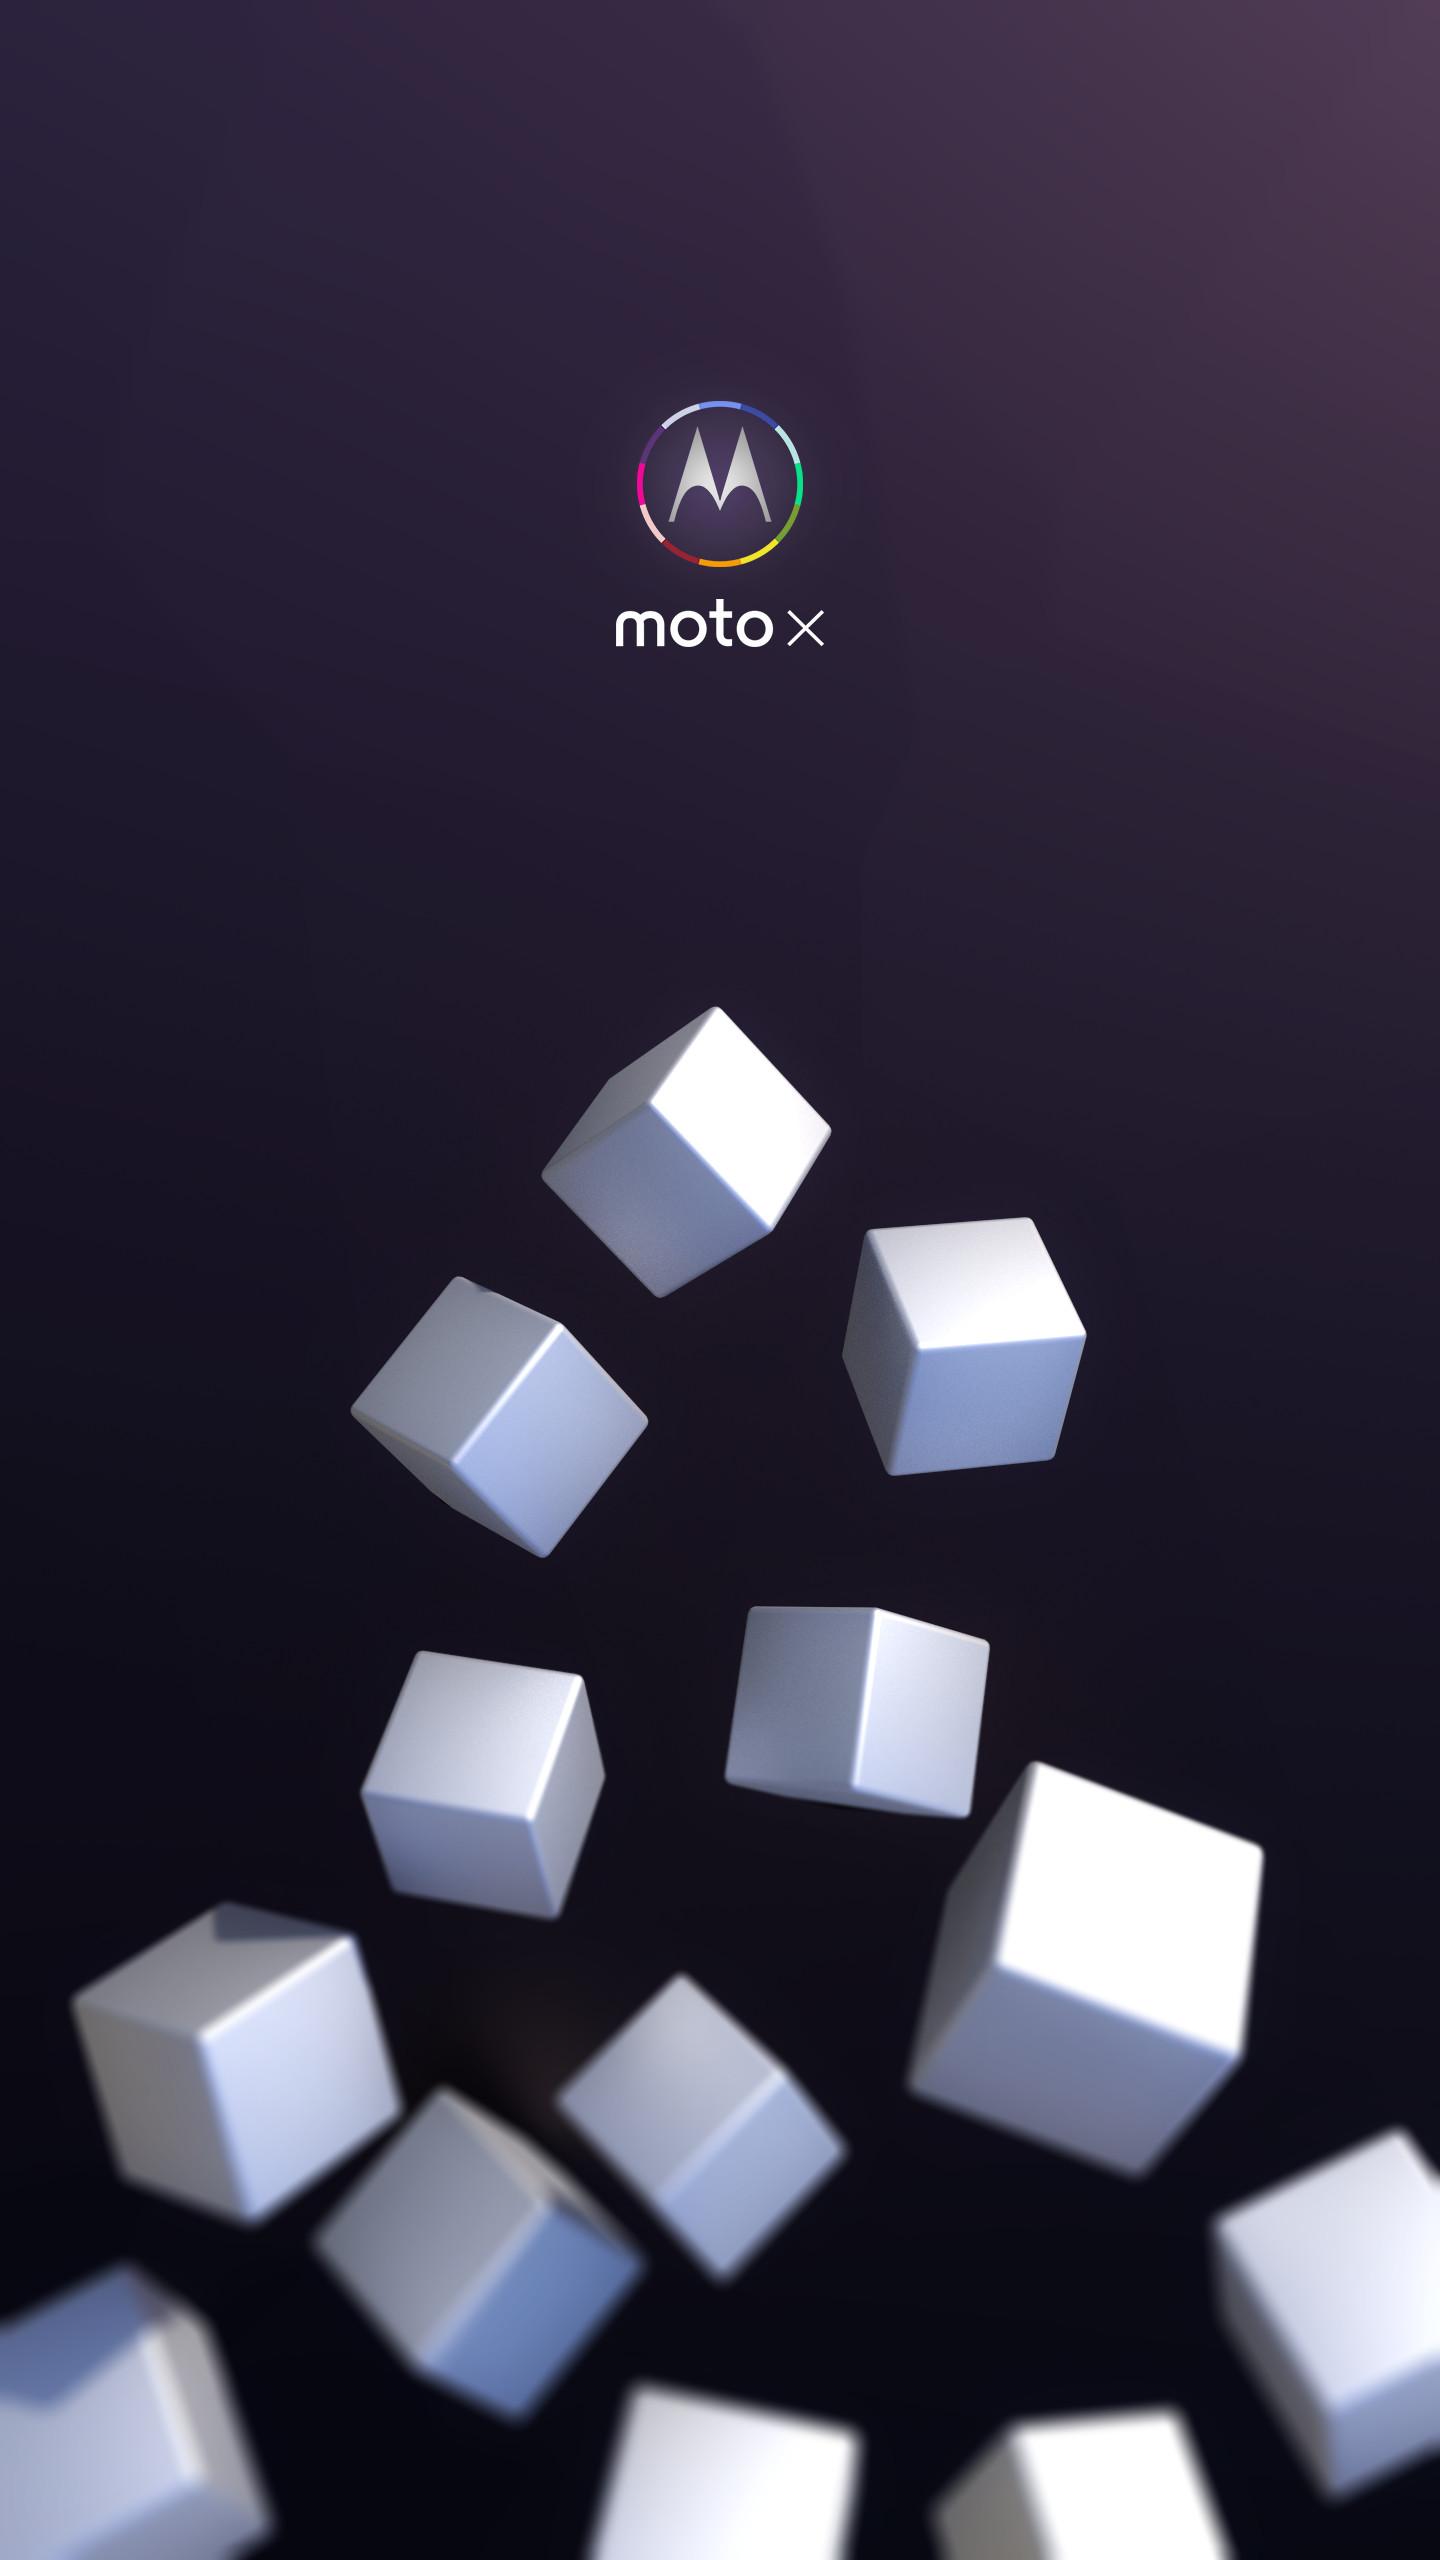 moto x pure wallpaper  Moto X Pure Wallpapers (48  images)